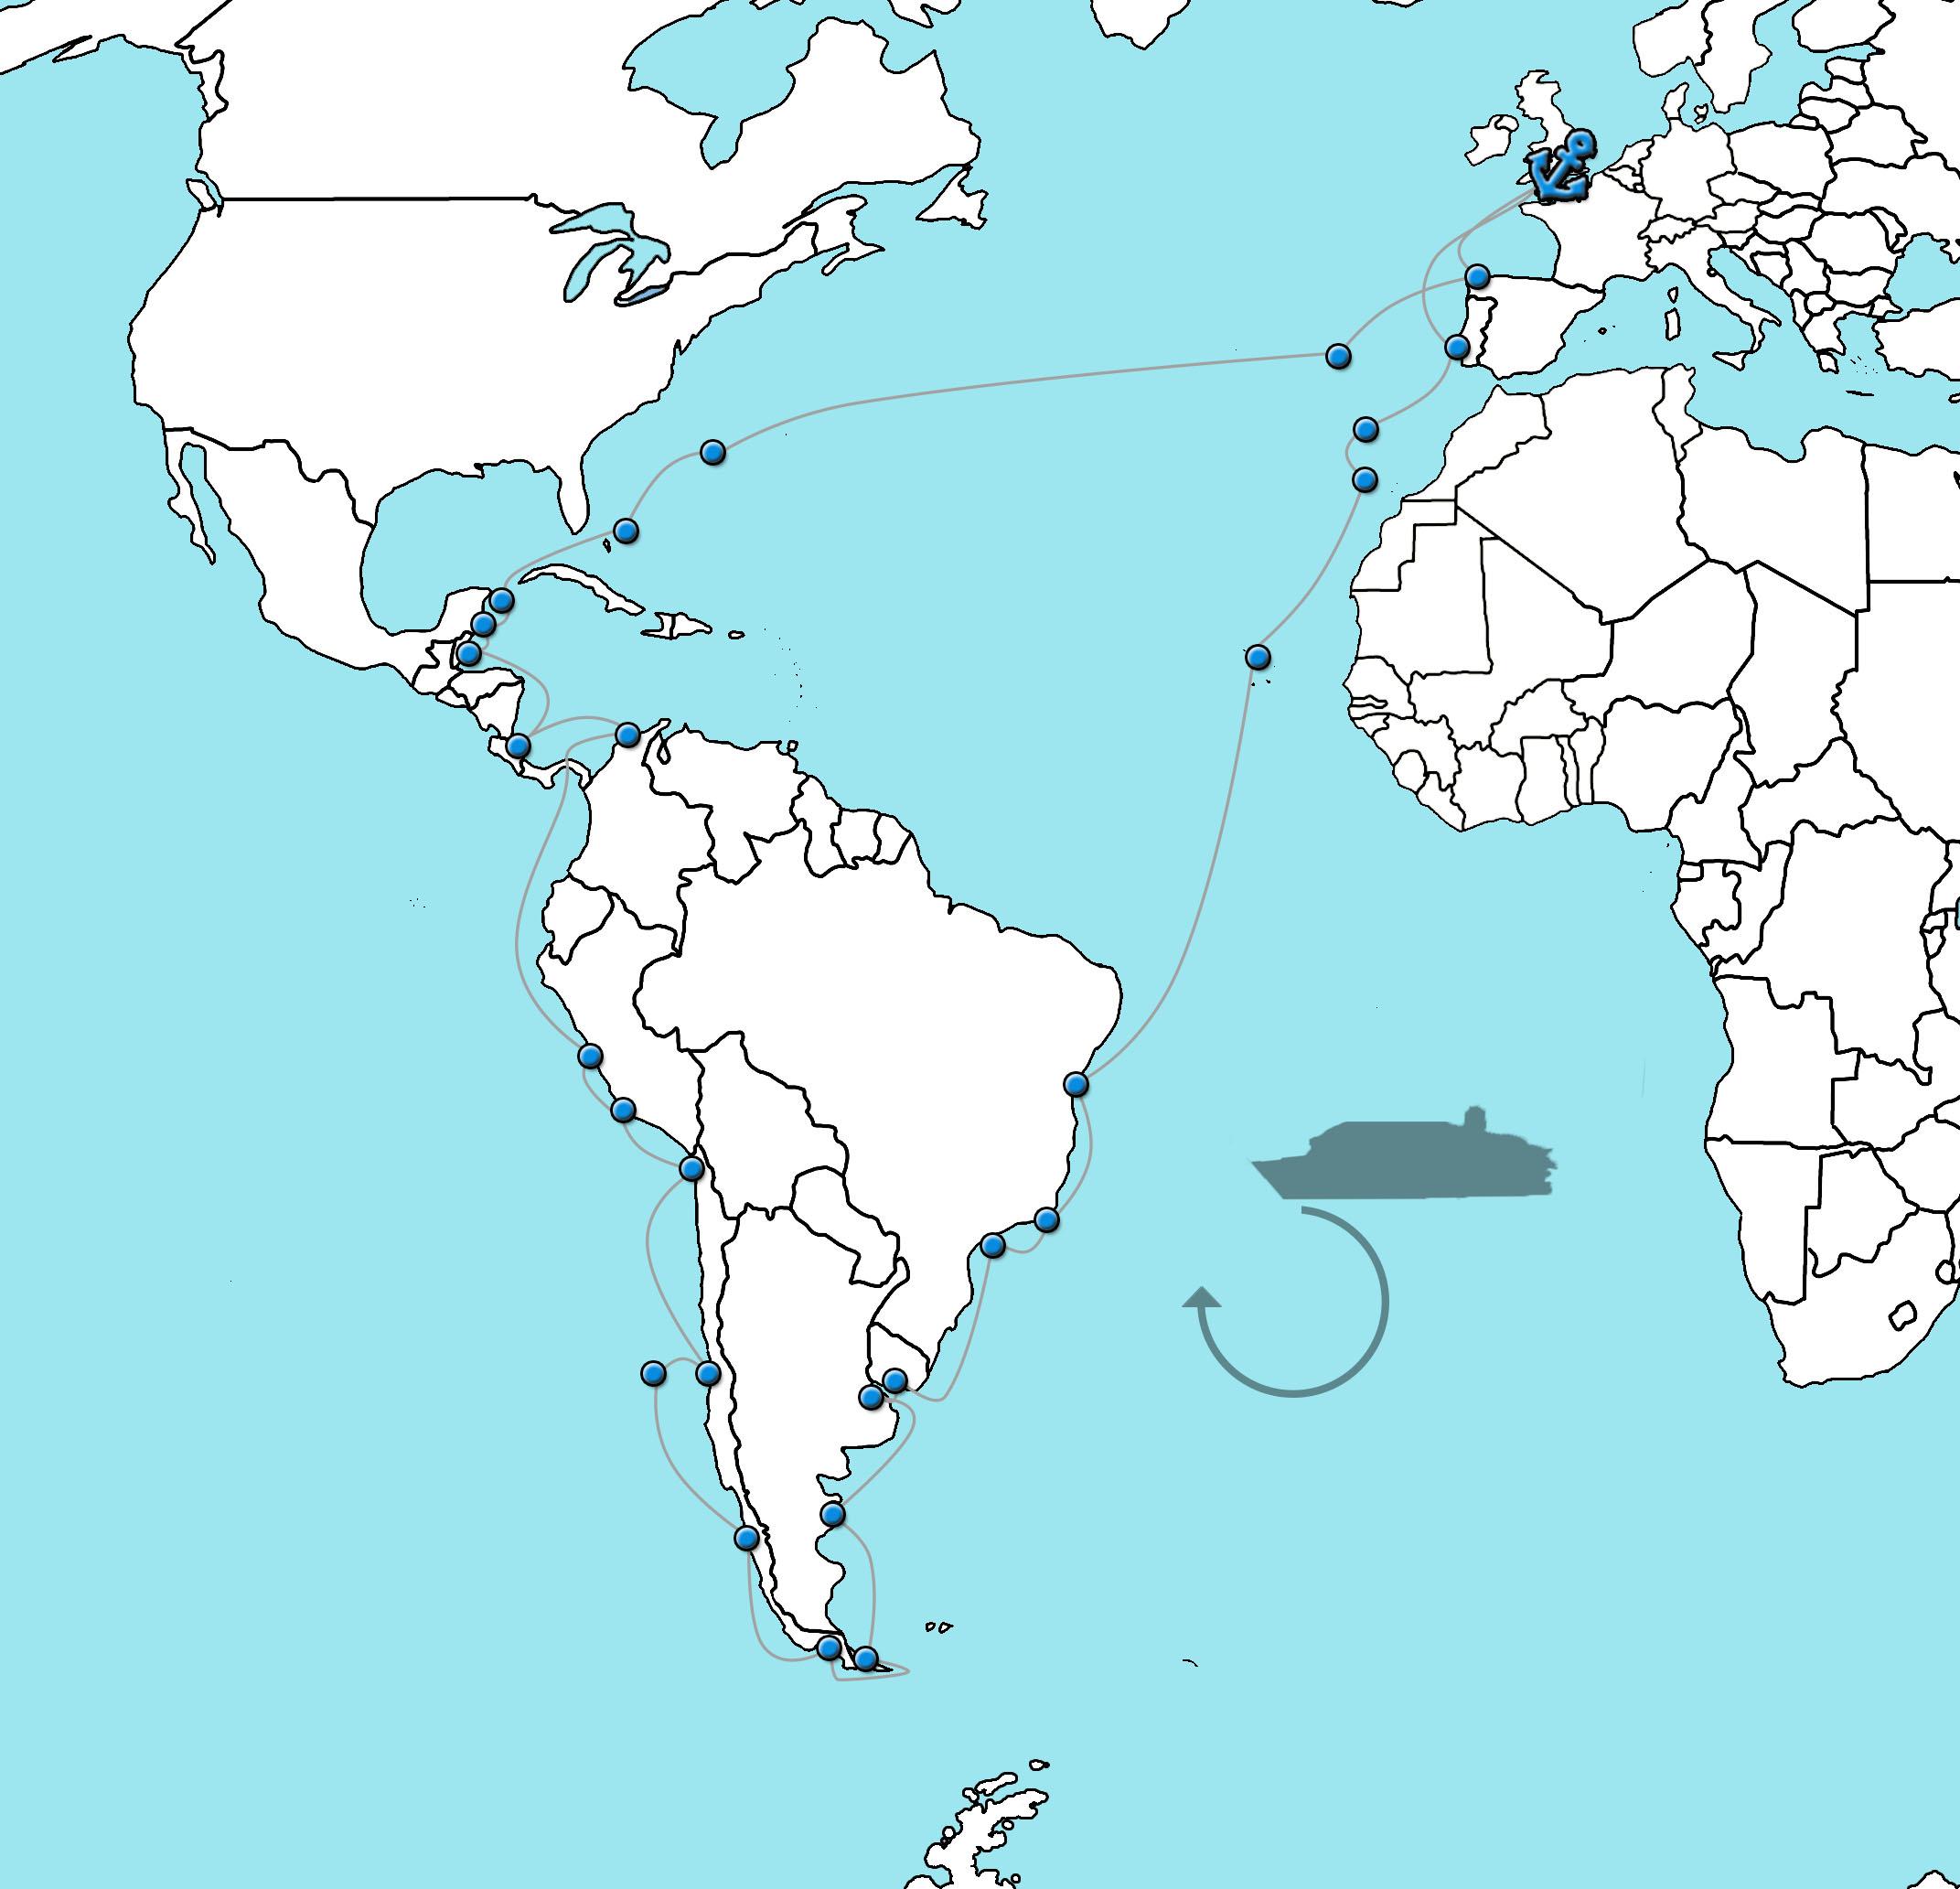 Cruise naar Latijns Amerika - Bolette 2022